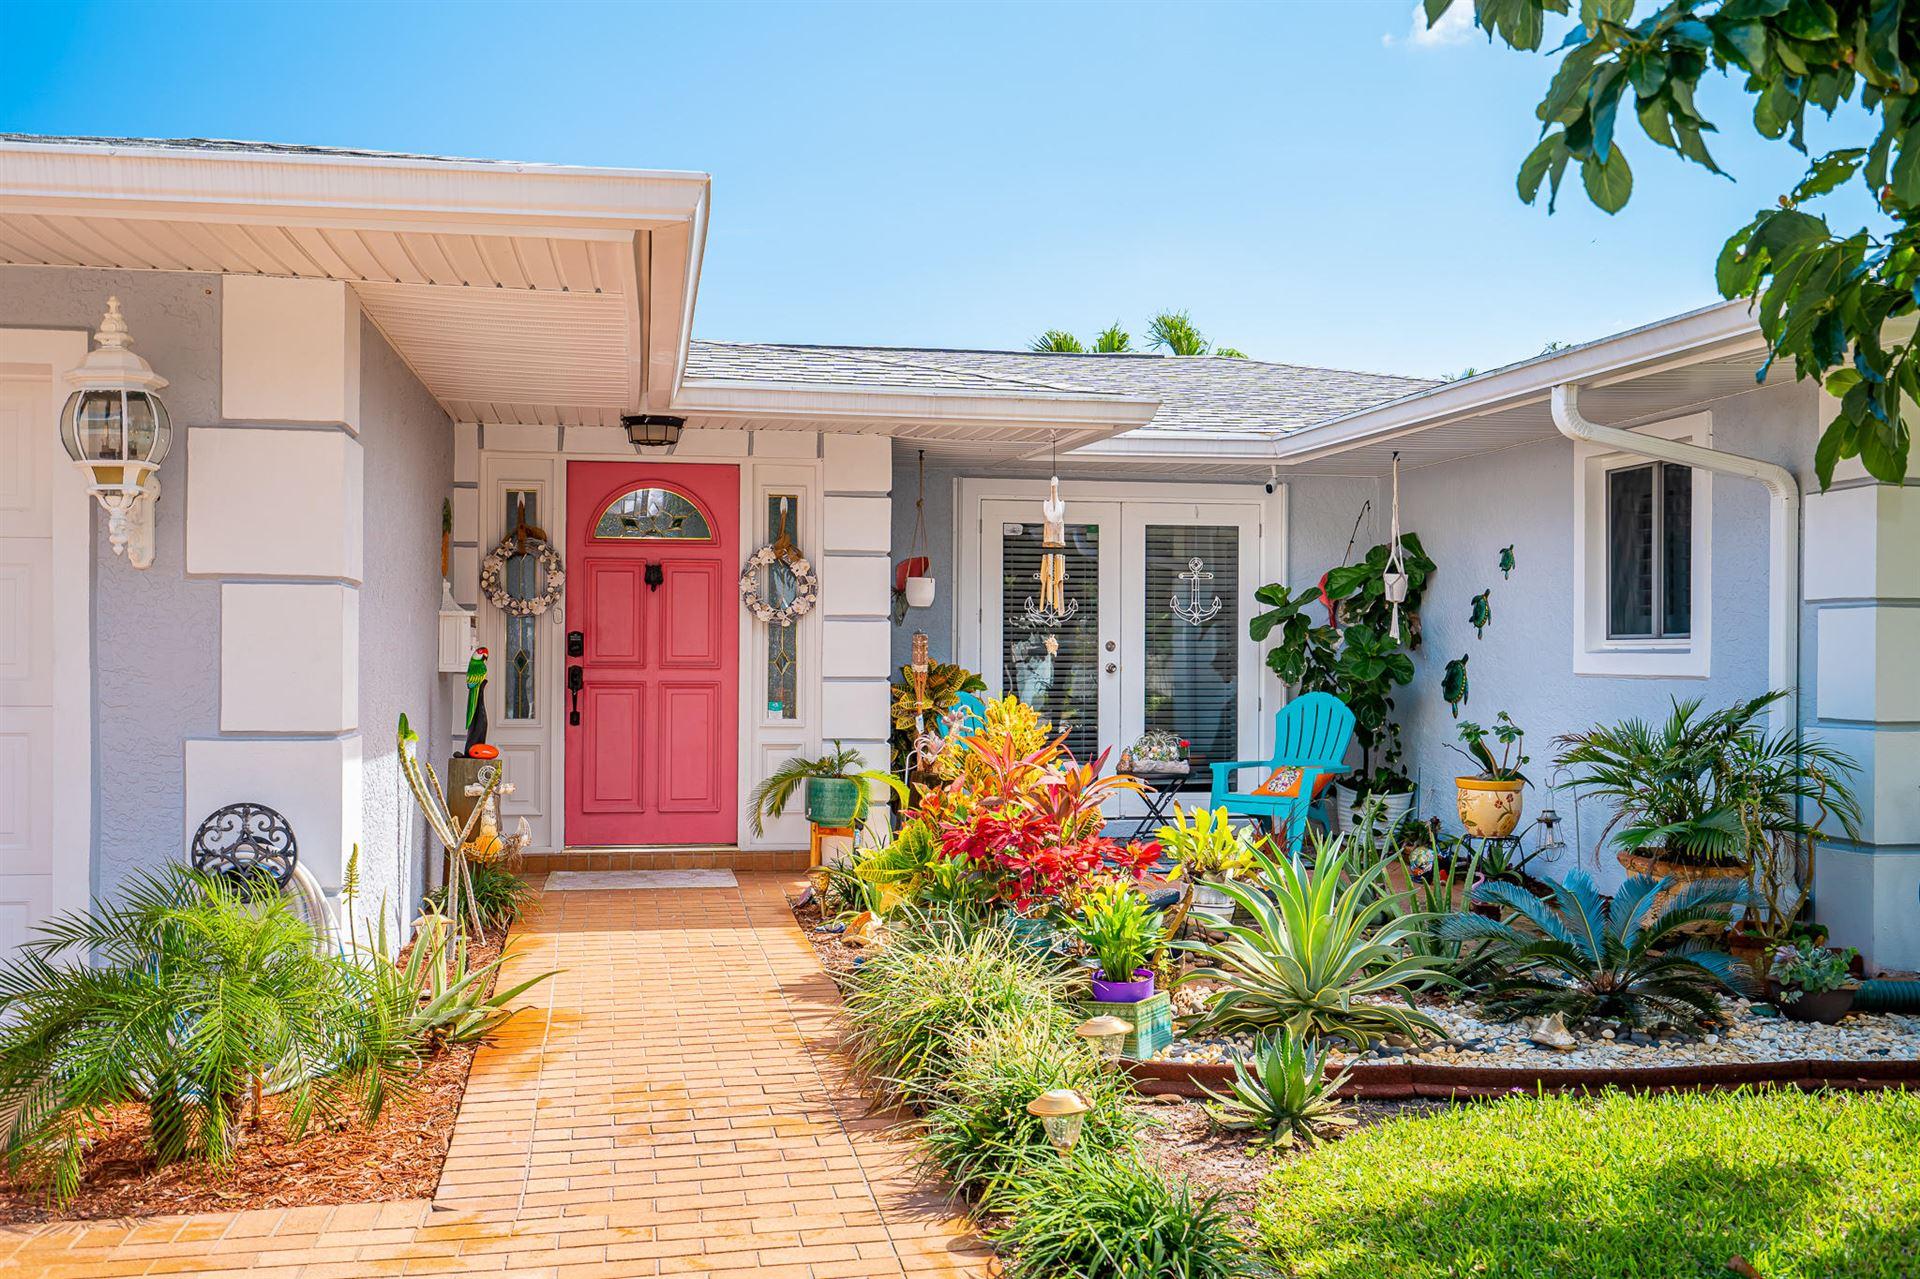 Photo of 905 Evergreen Drive, North Palm Beach, FL 33408 (MLS # RX-10694578)